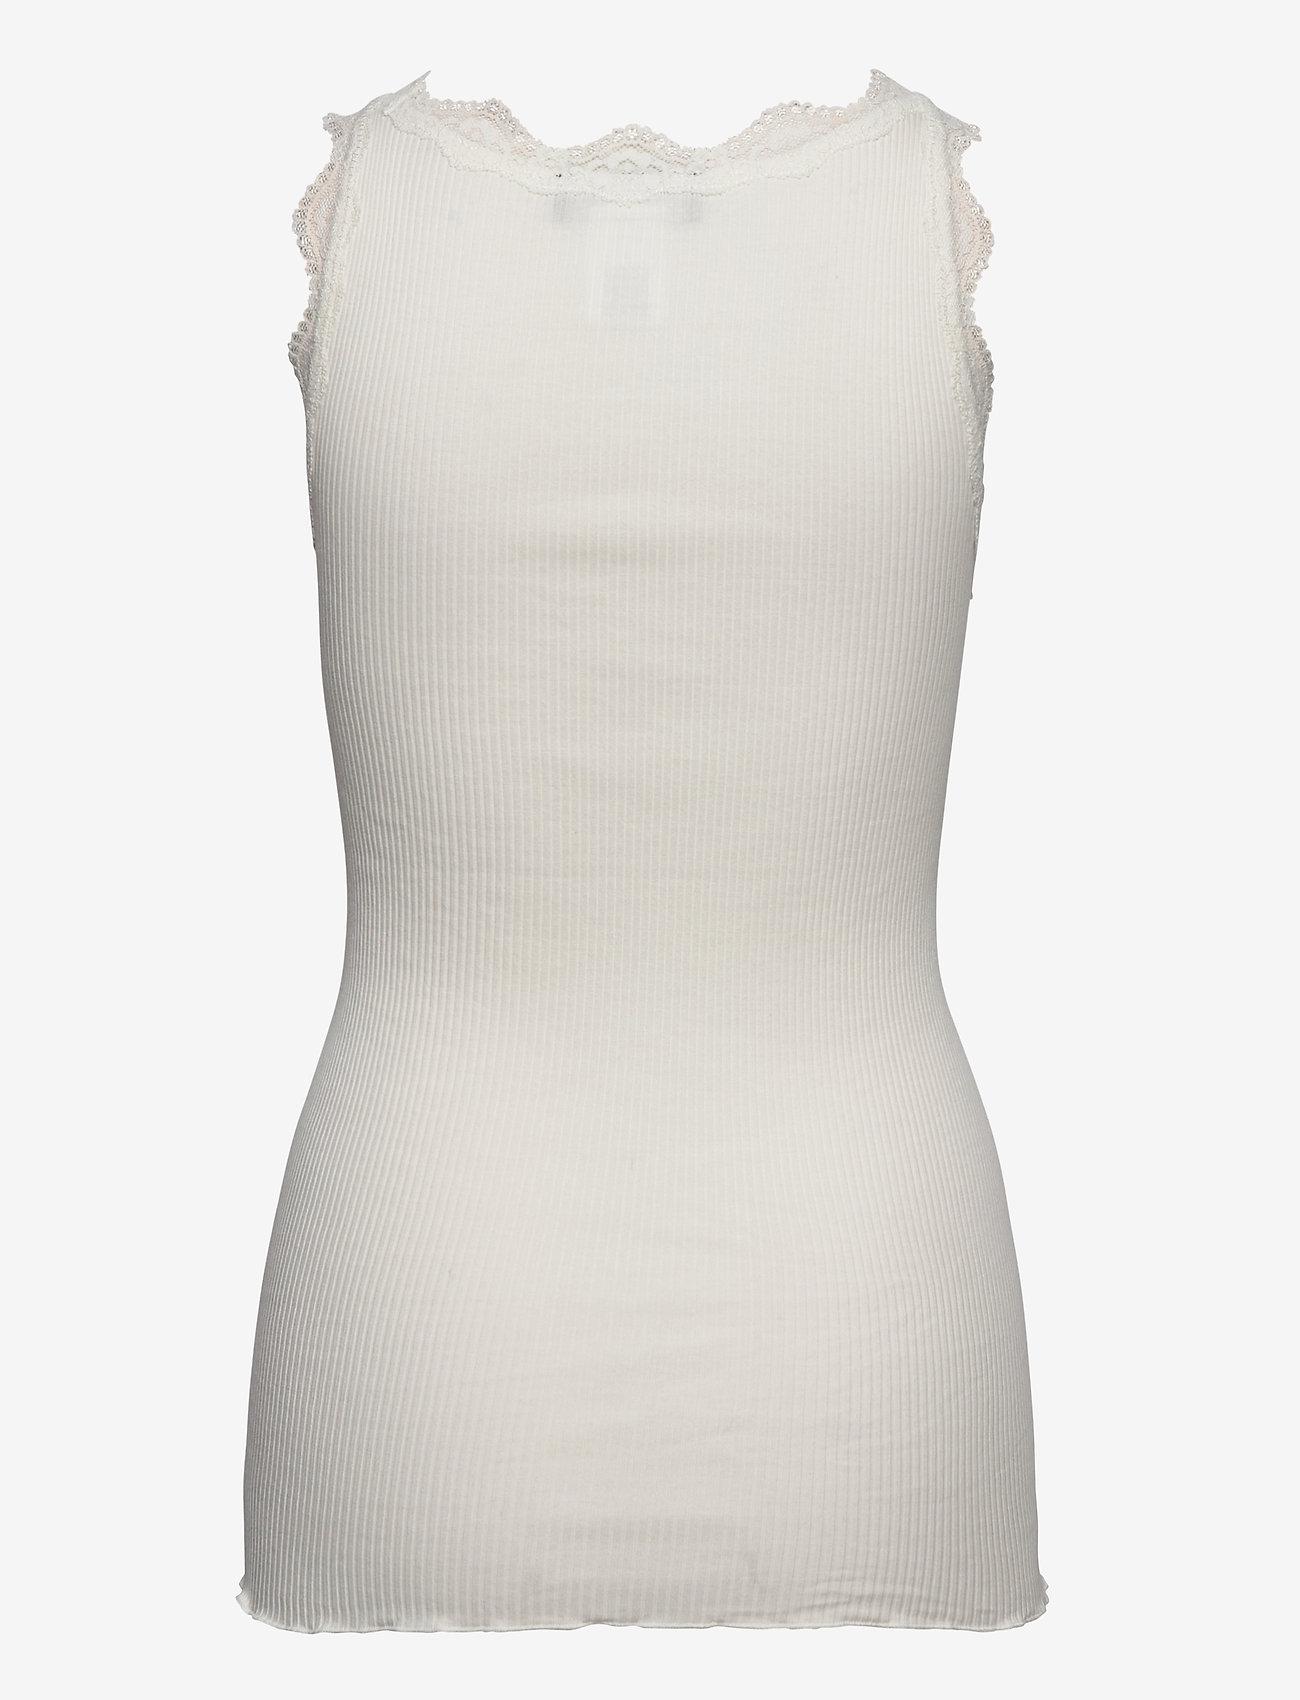 Rosemunde - Organic top w/ lace - linnen - ivory - 1